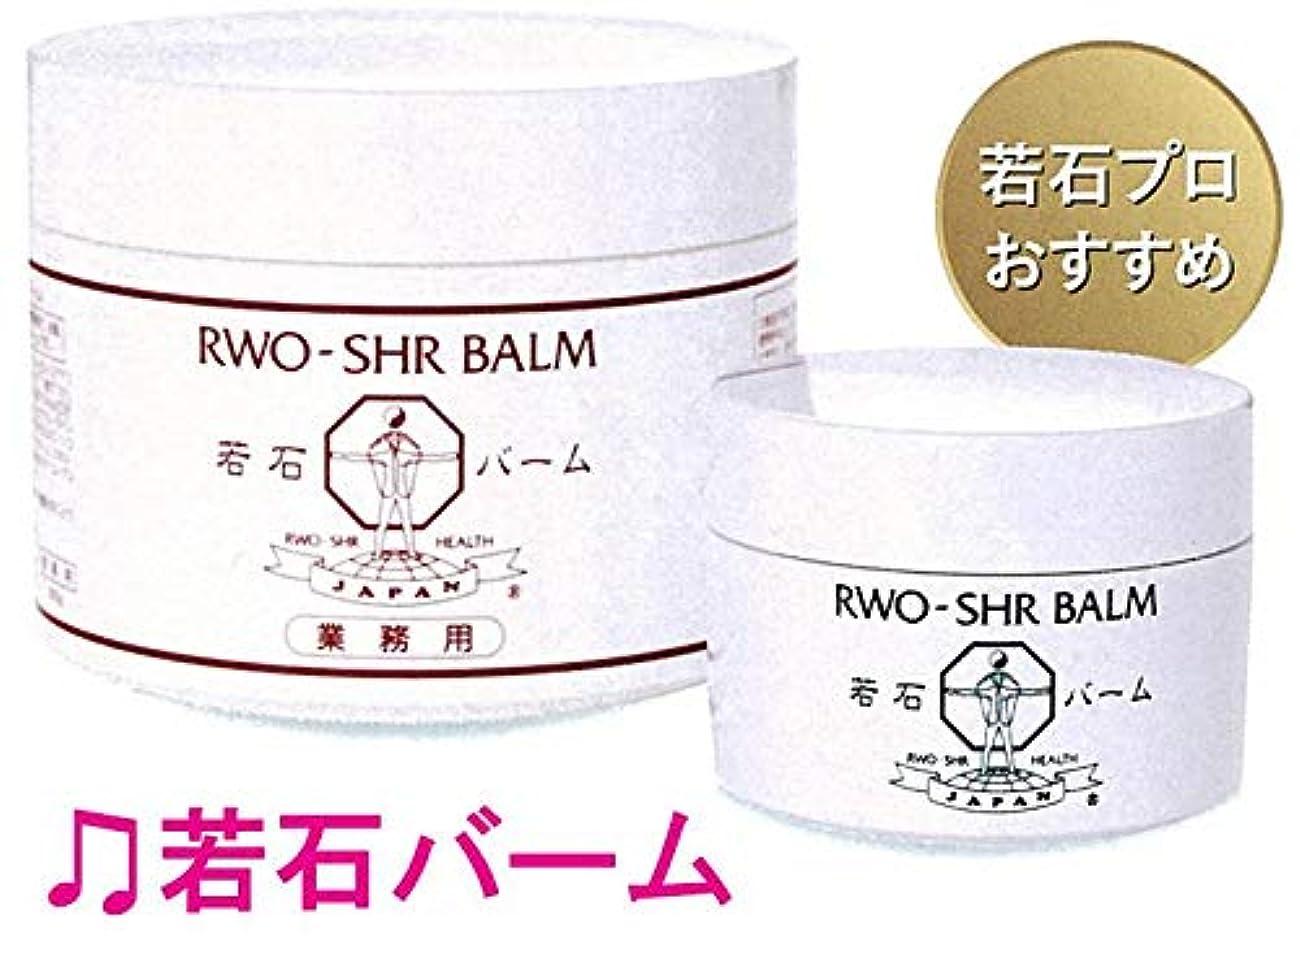 速い独立軽若石バーム(250g) RWO-SHR BALM 国際若石健康研究会正規品